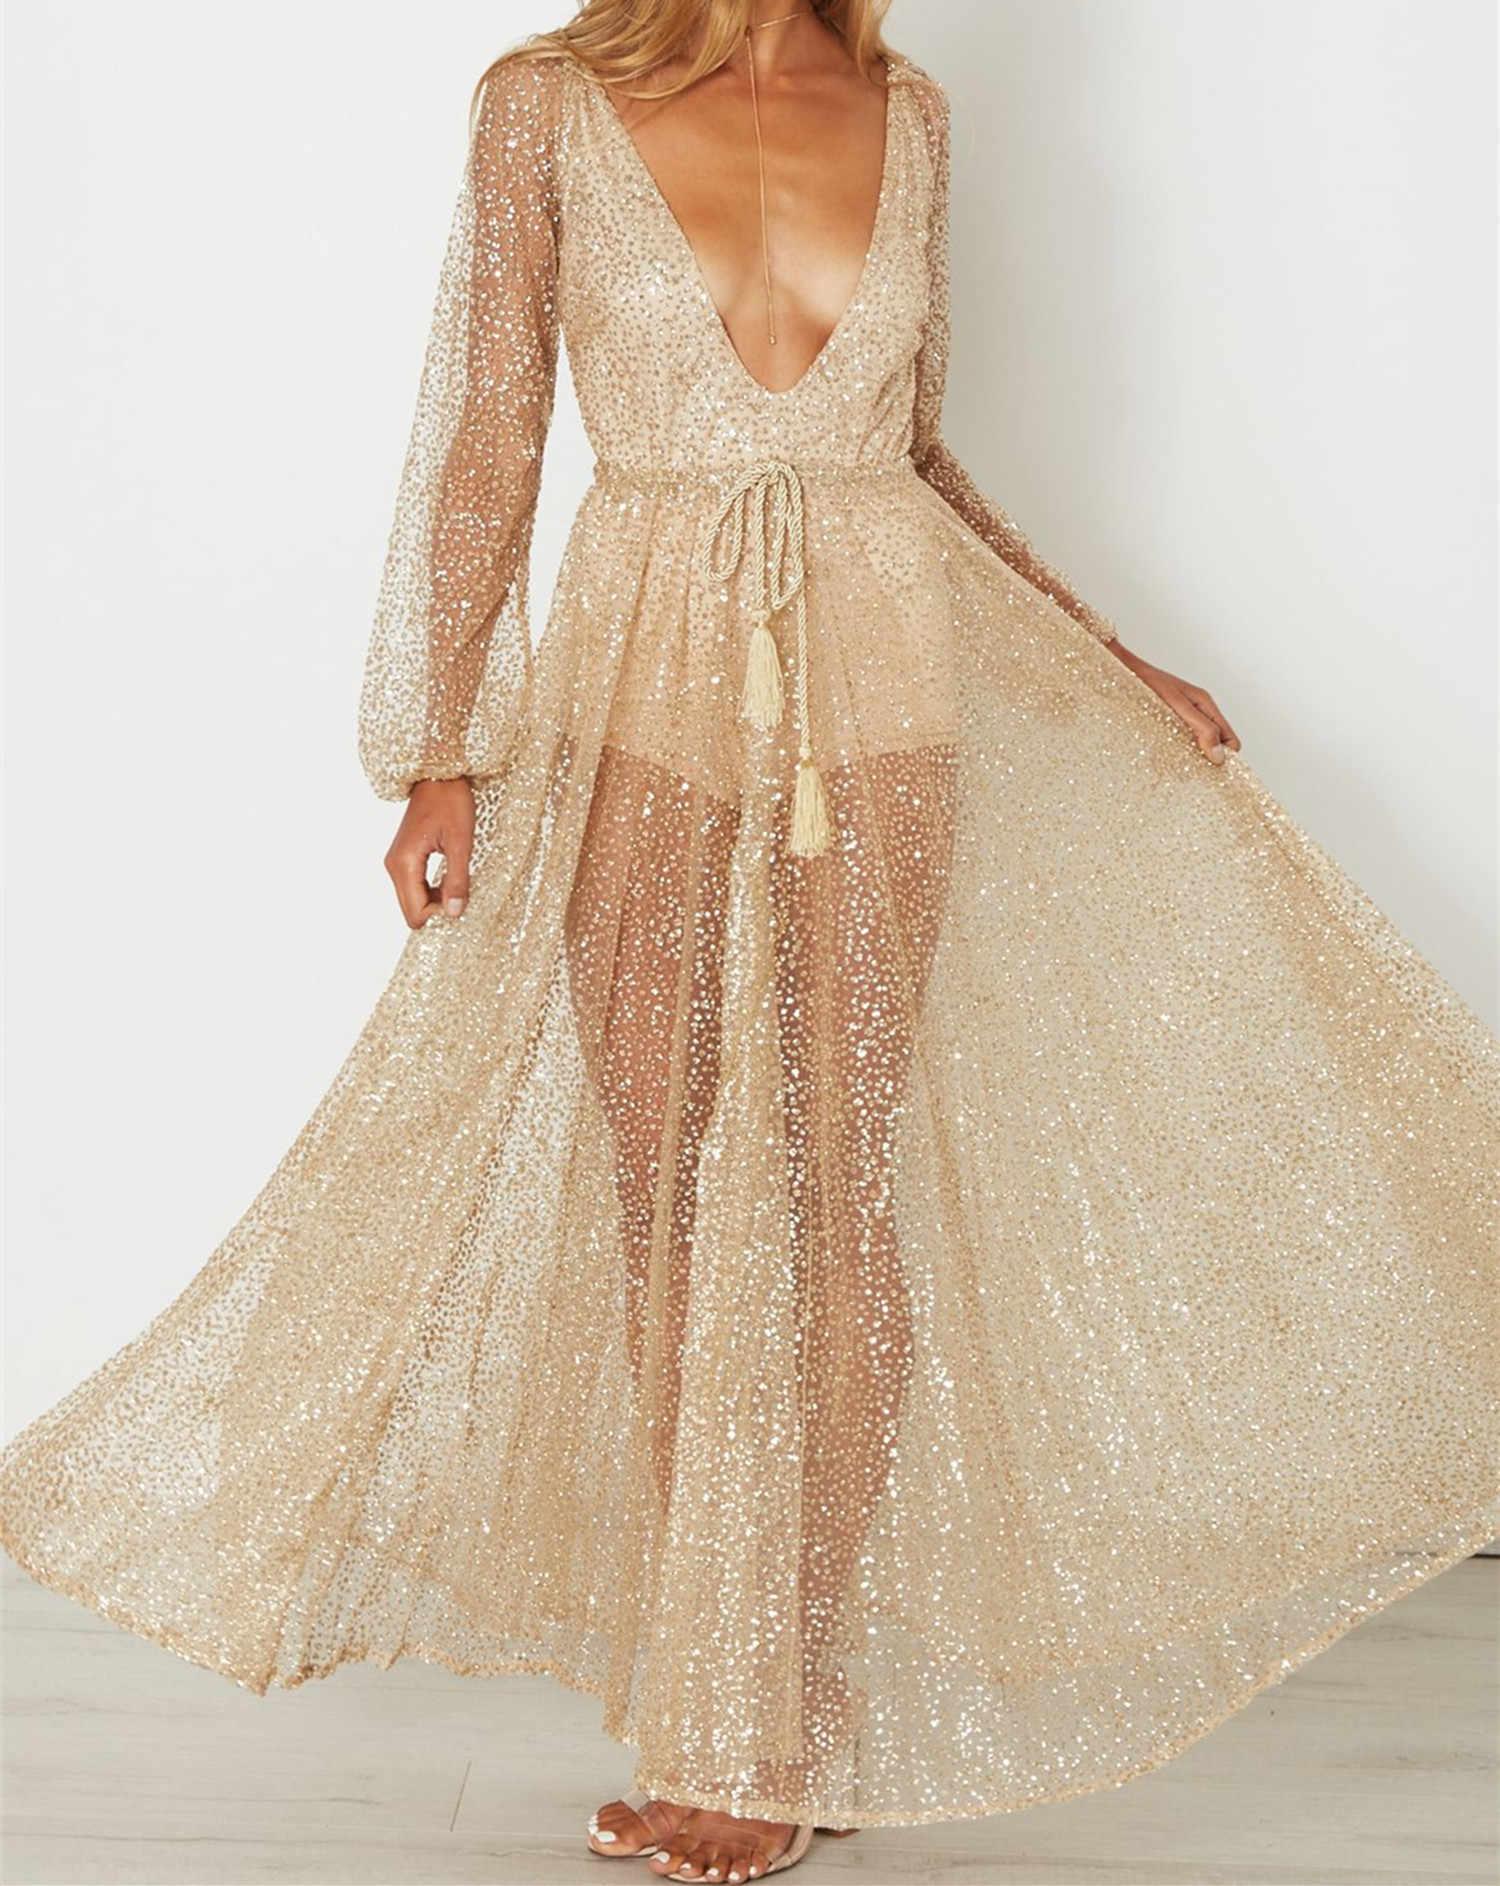 19efcd79d7 ... V Neck Long Sleeve Sequin Party Dresses Sexy Mesh See Through Dress  Women Boho Long Maxi ...